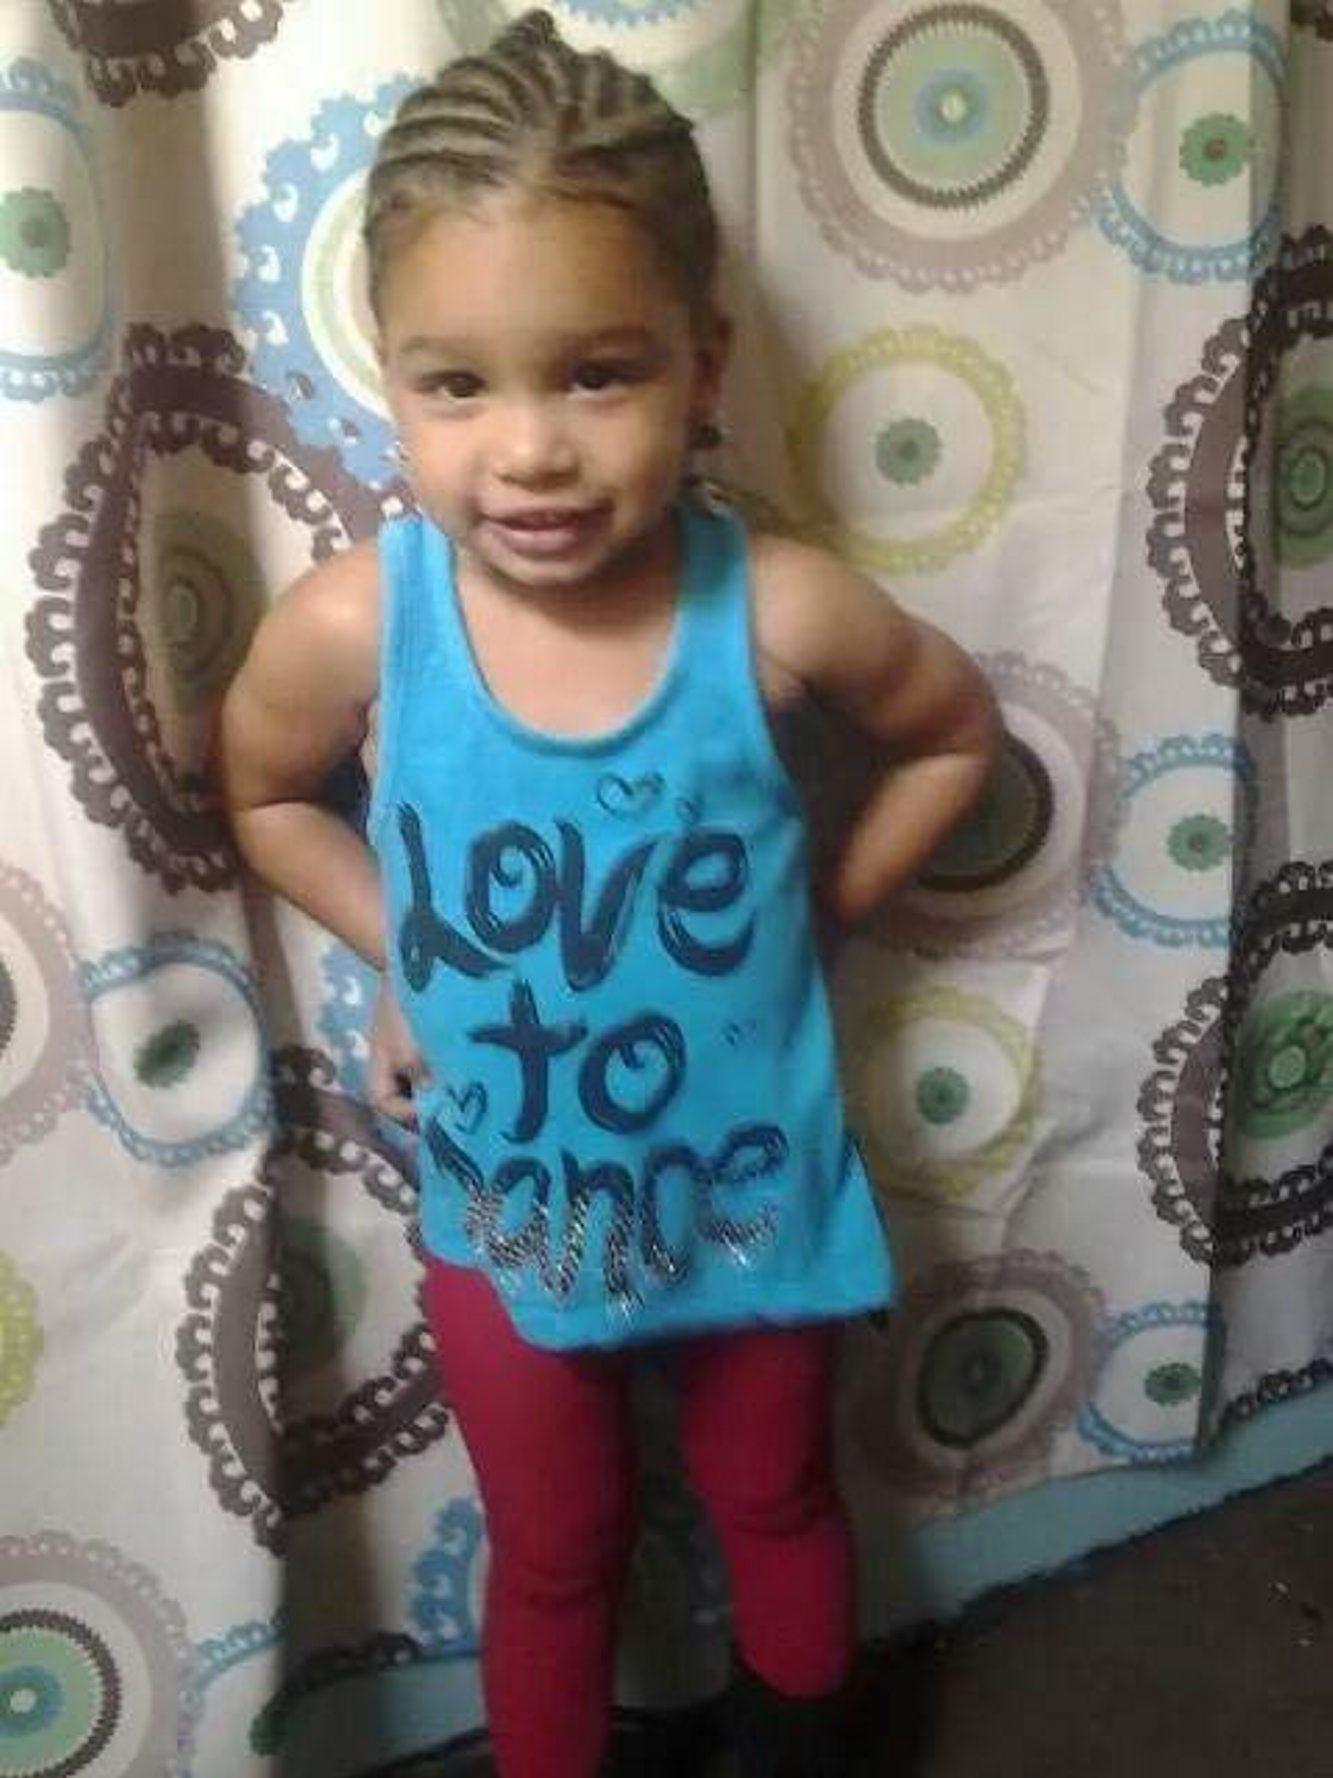 Xayeliz Alicea was critically injured in a hit-and-run Sunday.